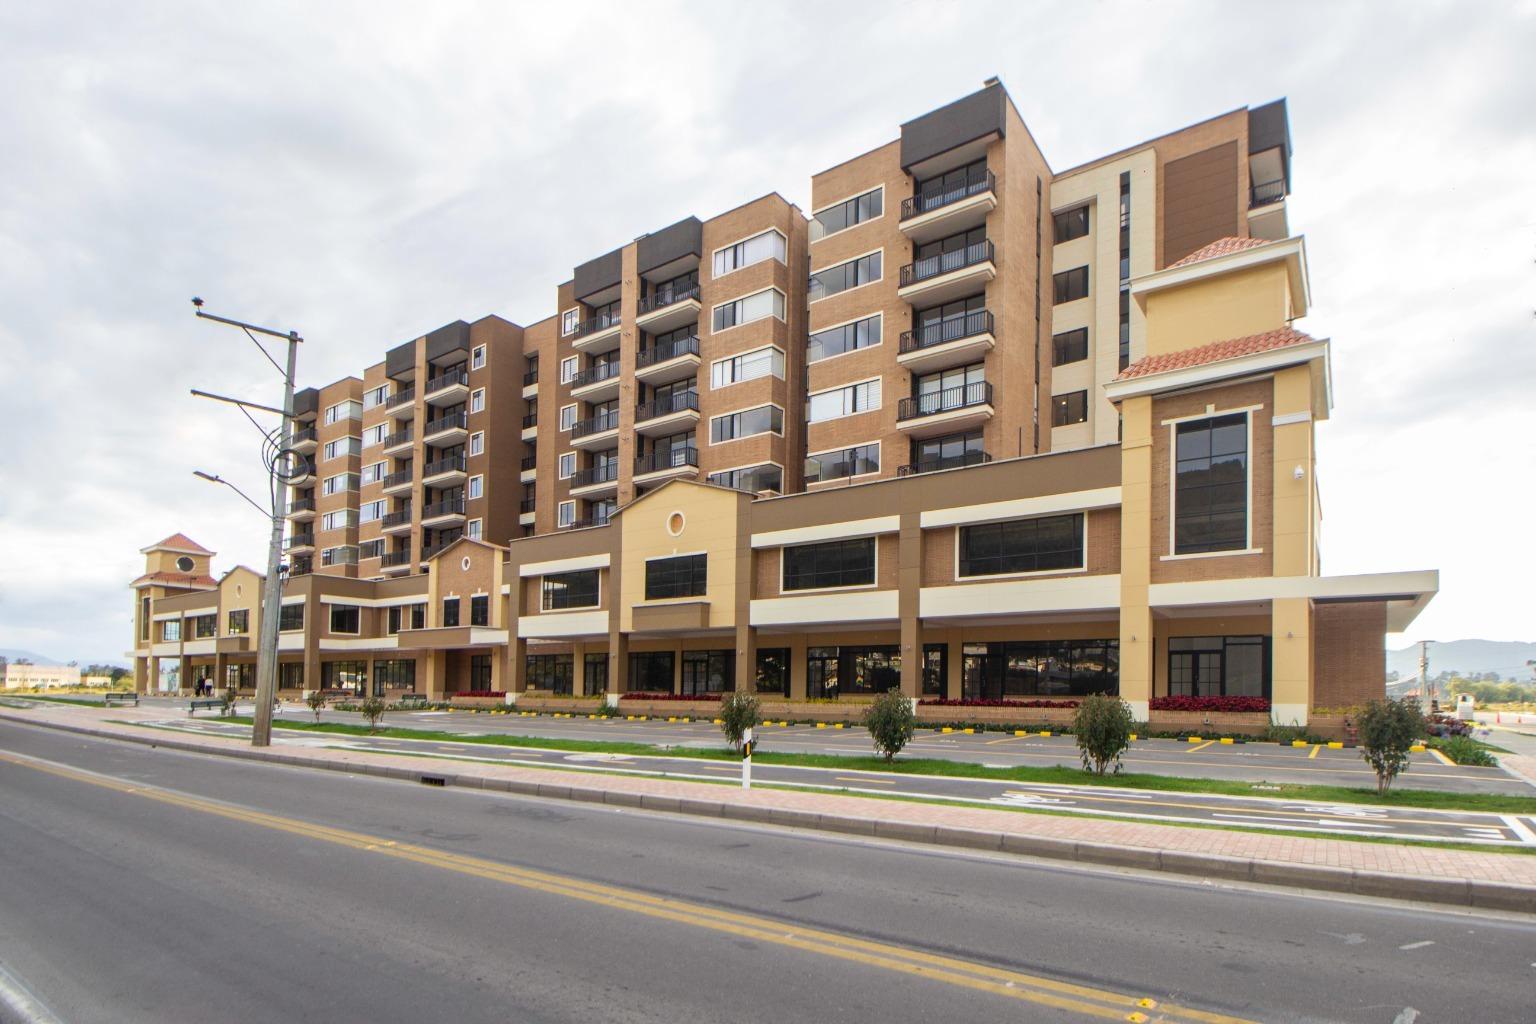 98668 - Exclusivo Apto 98 m2 en Pionono Condominio Club - Club House, Sopo